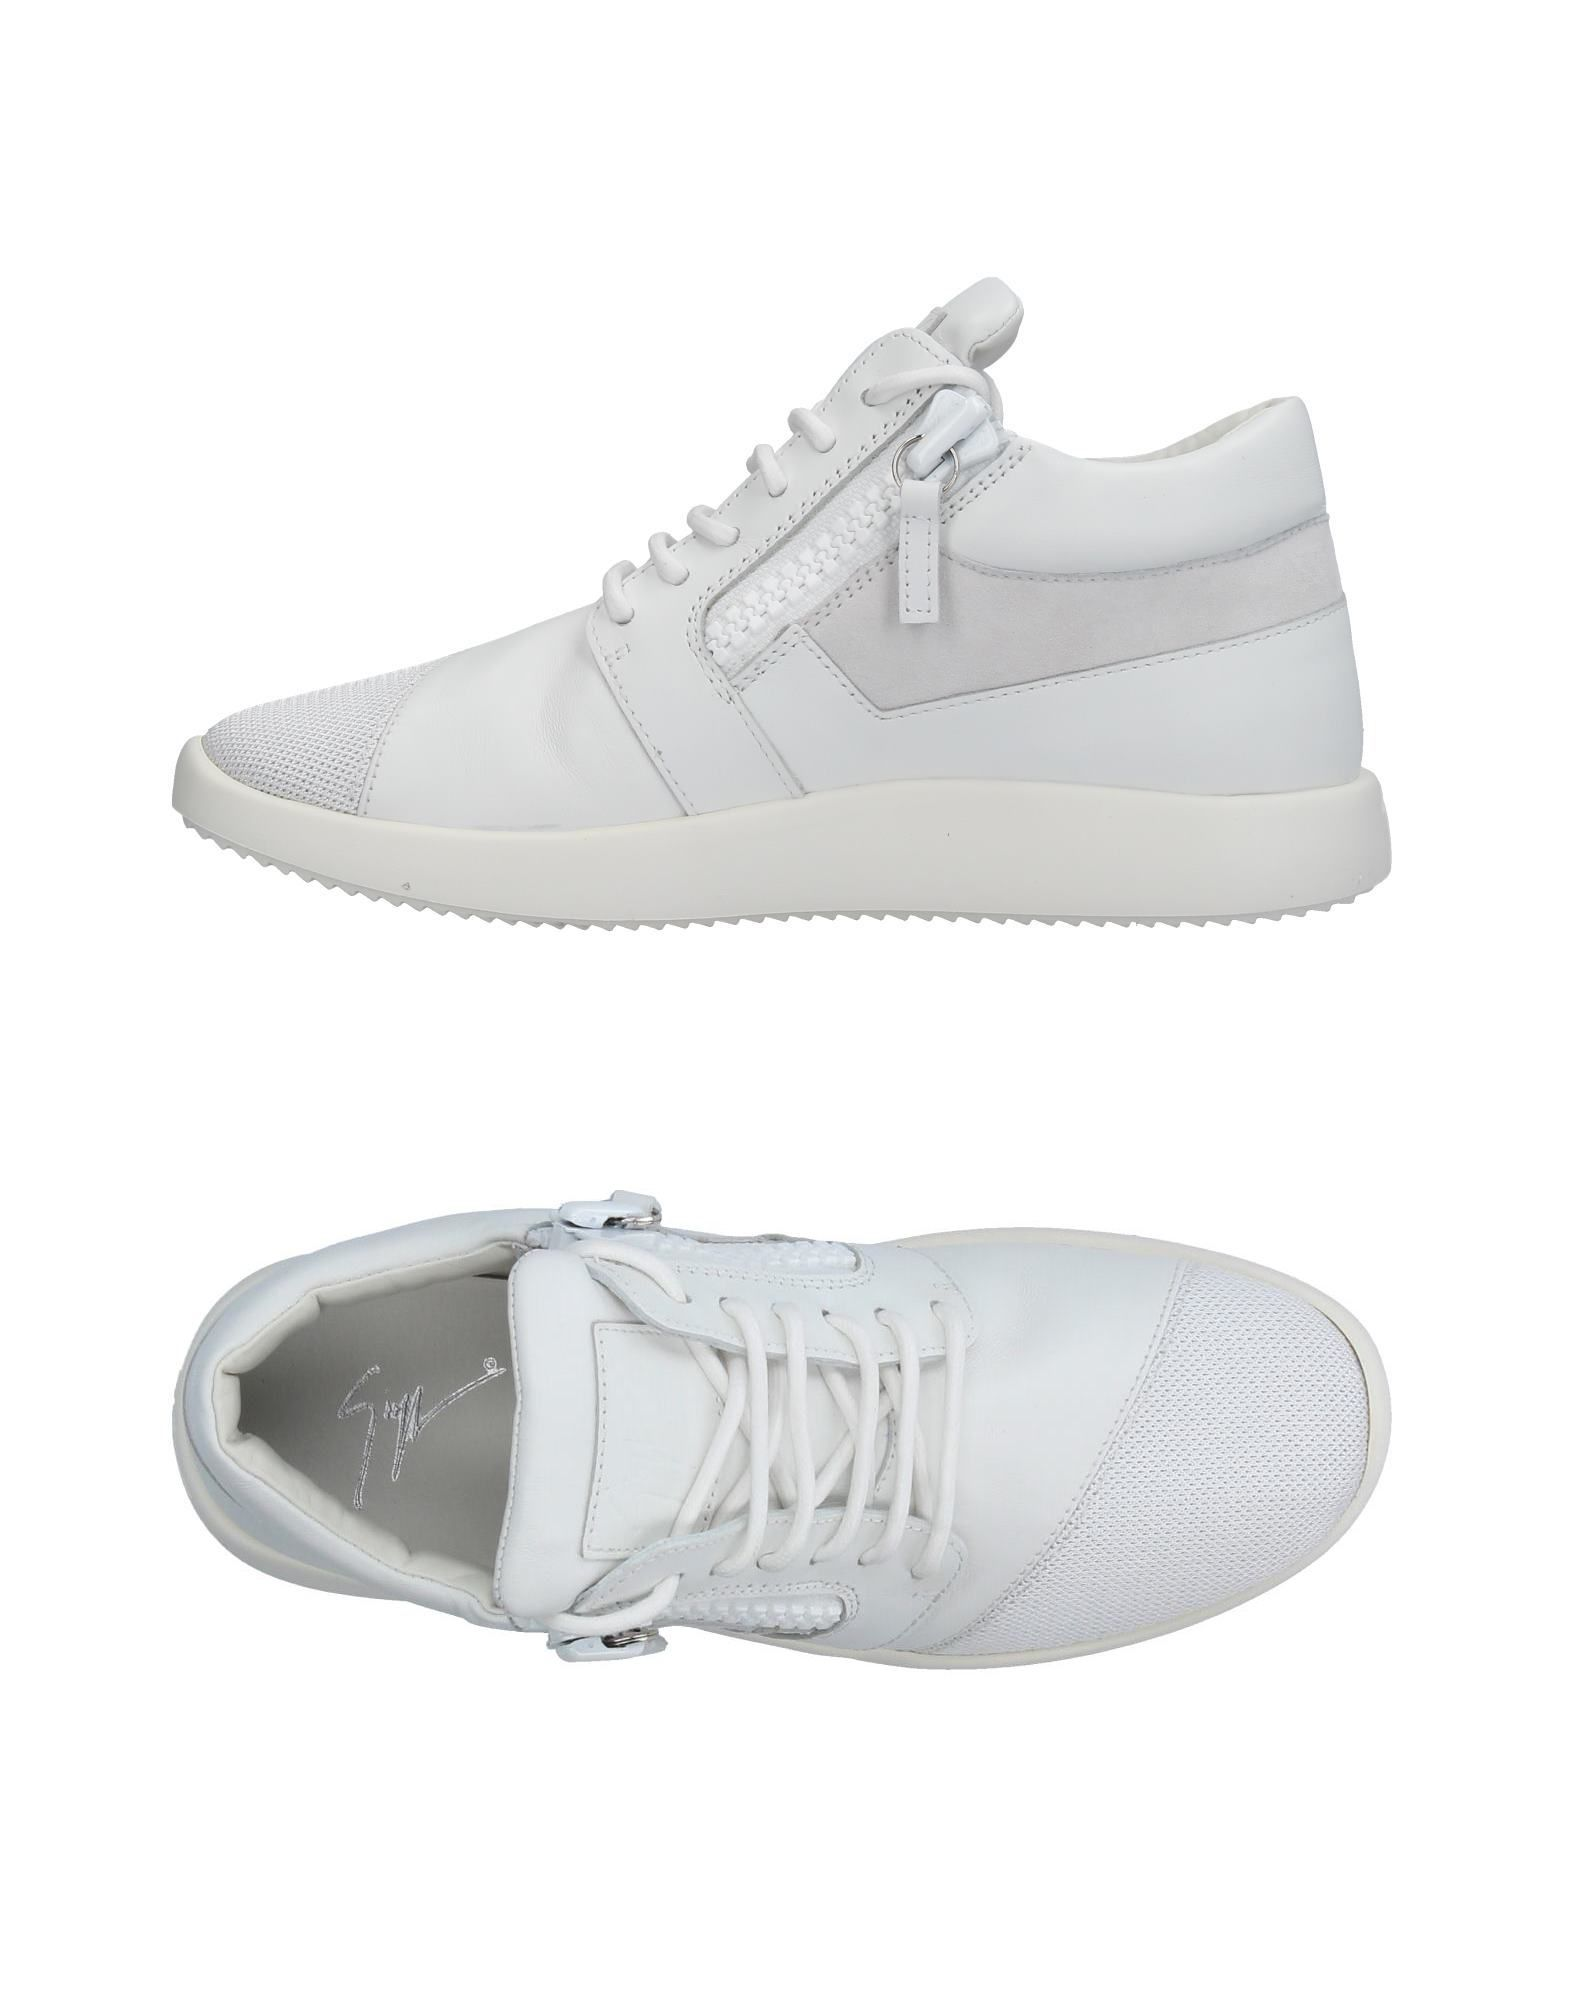 Giuseppe Zanotti Sneakers Damen 11207486CE  11207486CE Damen Neue Schuhe d97149